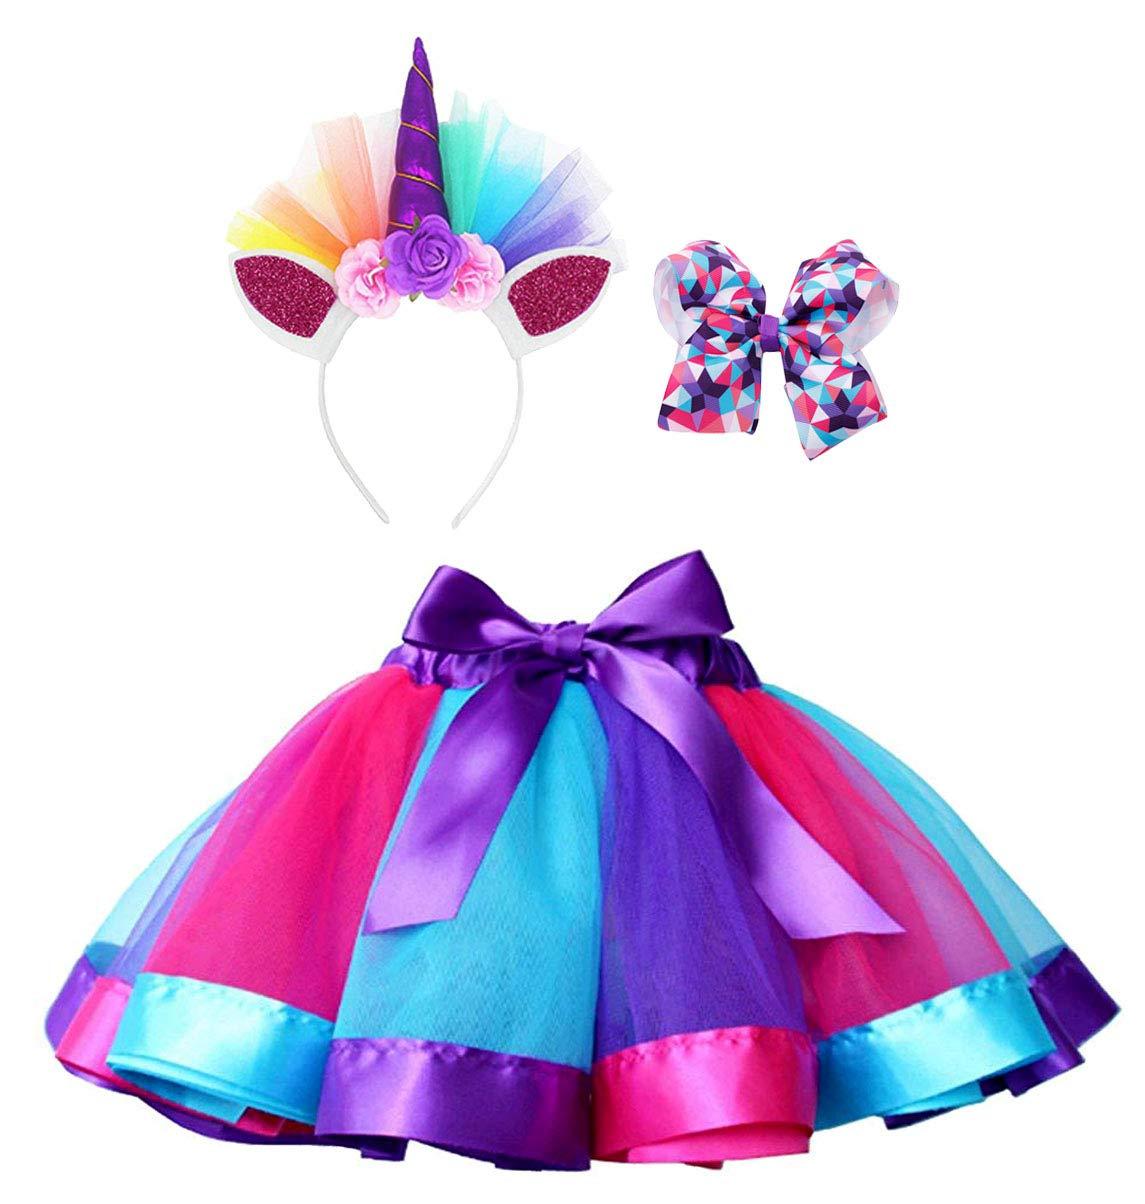 Simplicity Tutus for Girls Rainbow Layered Tulle Tutu Dress up Costume Unicorn Headband Hair Bow